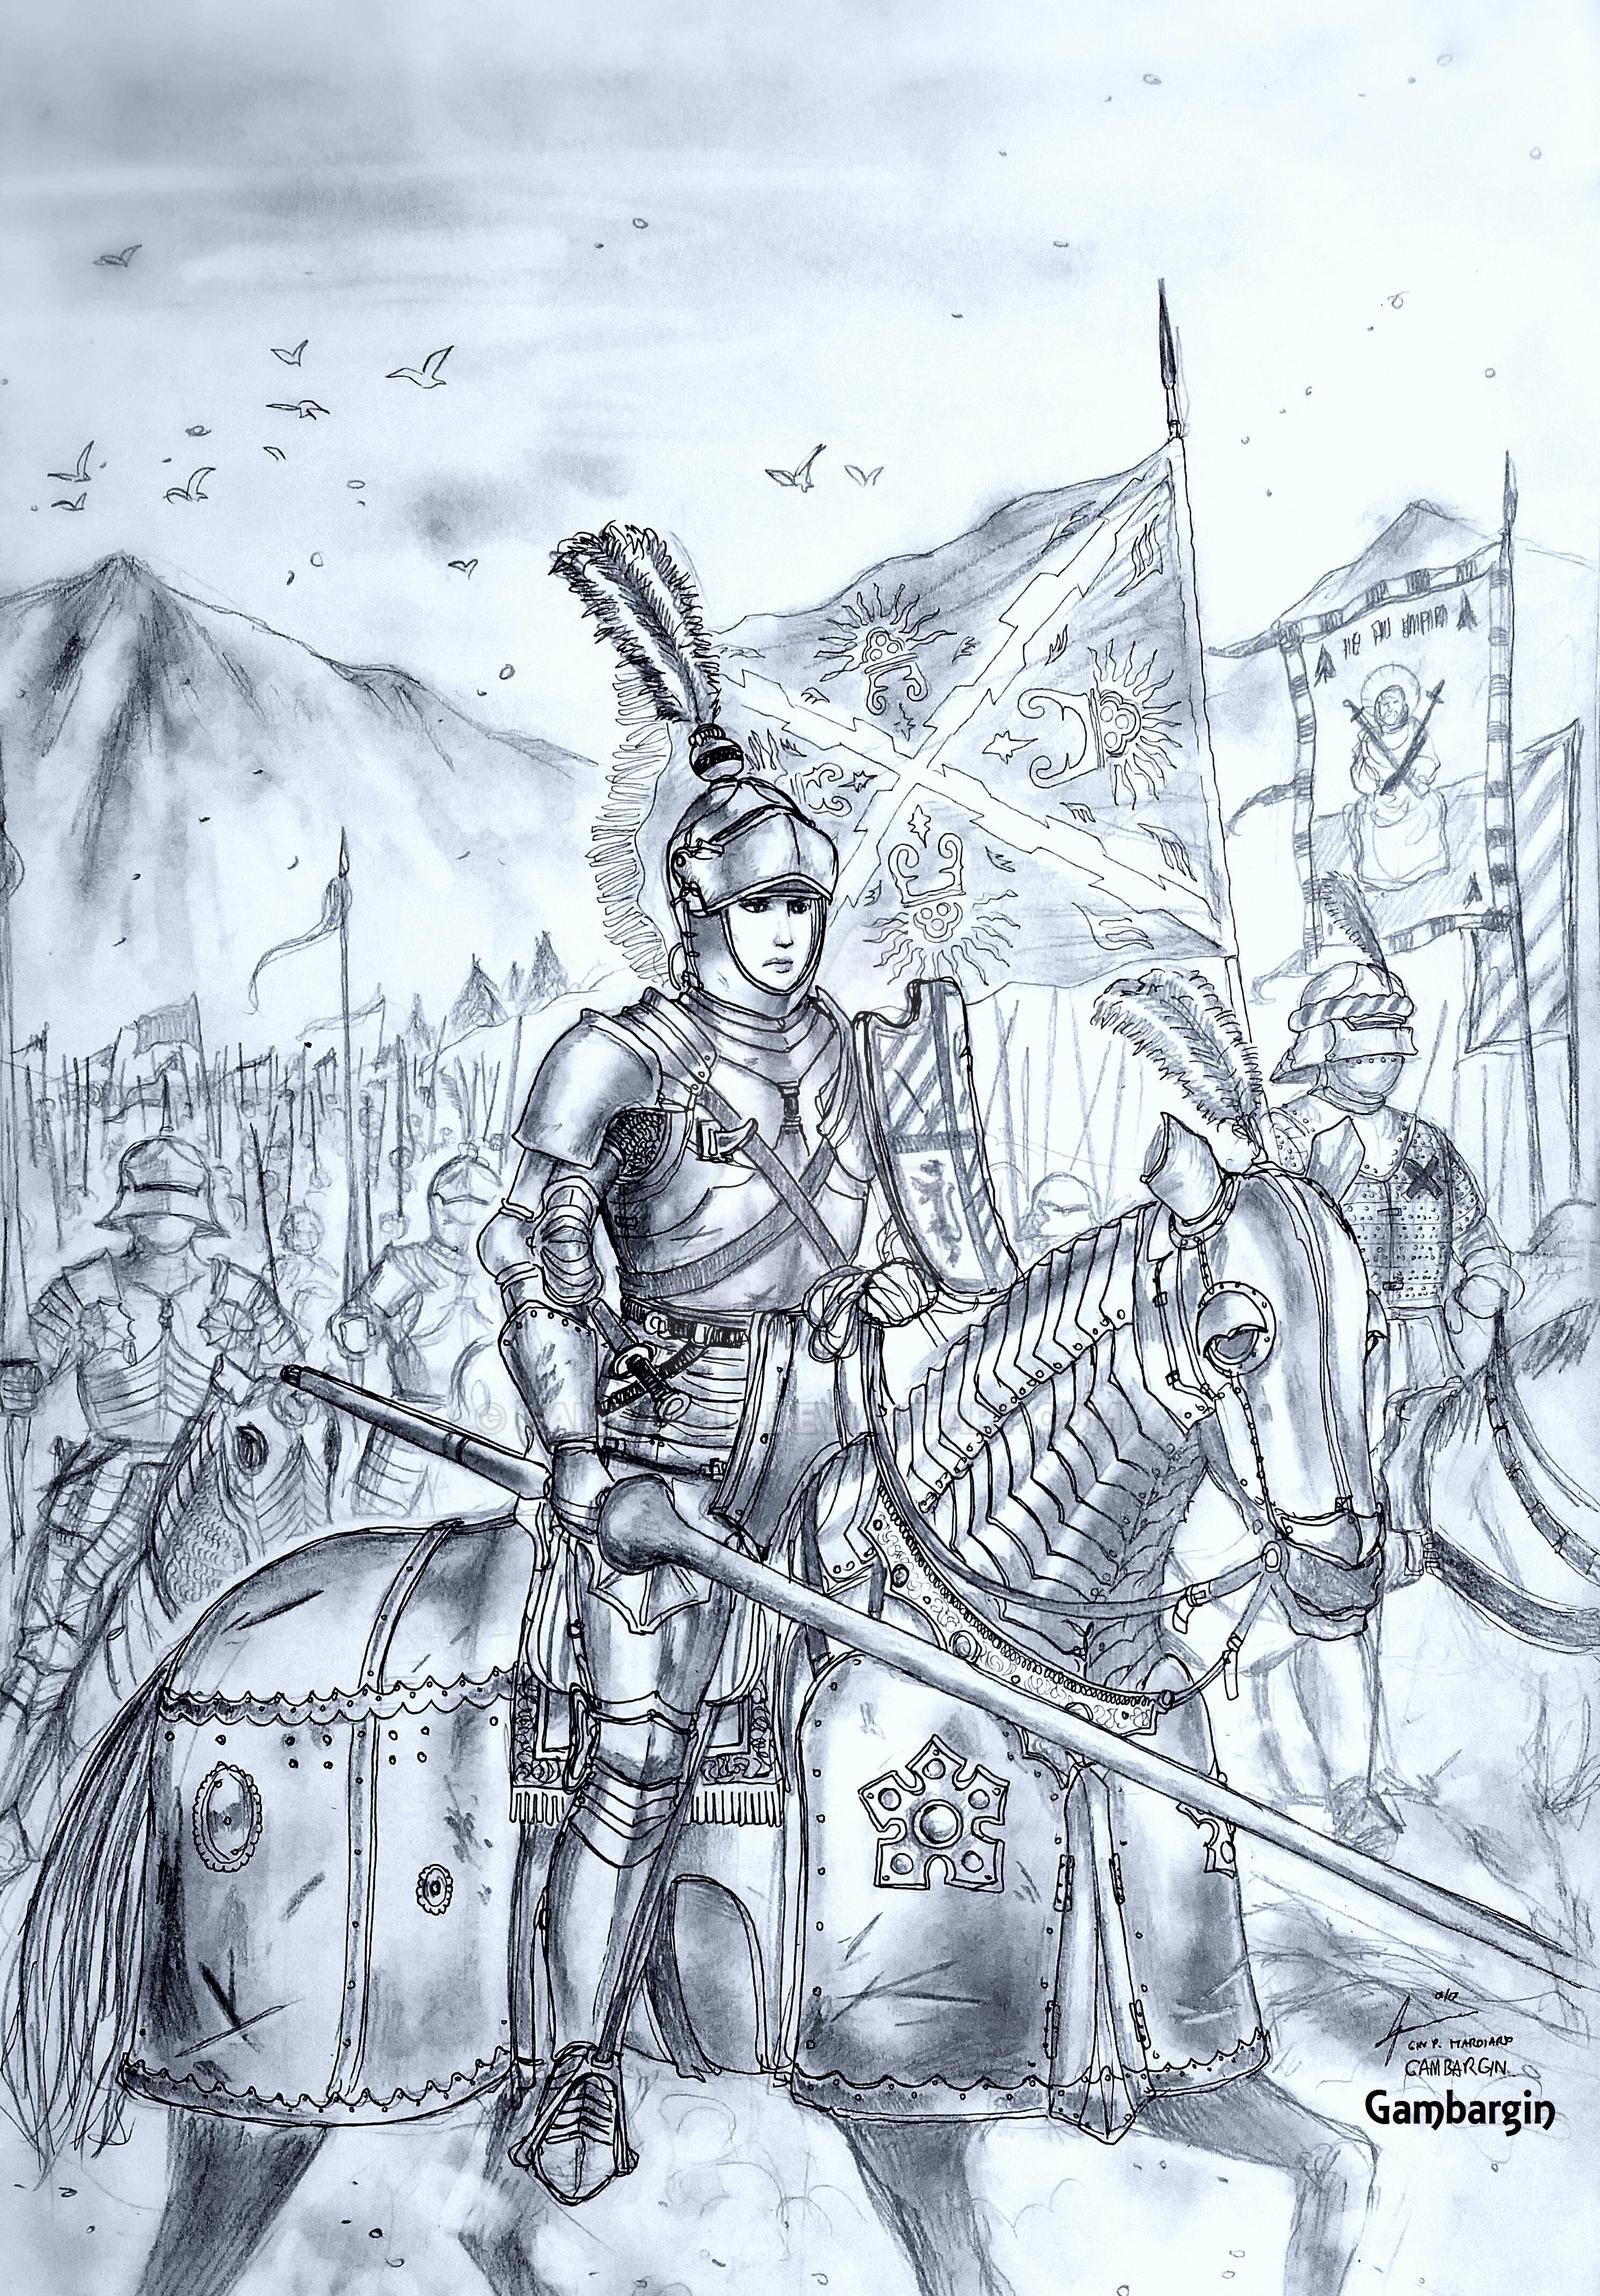 HWS Late Medieval Burgundian Woman Warrior Concept by Gambargin